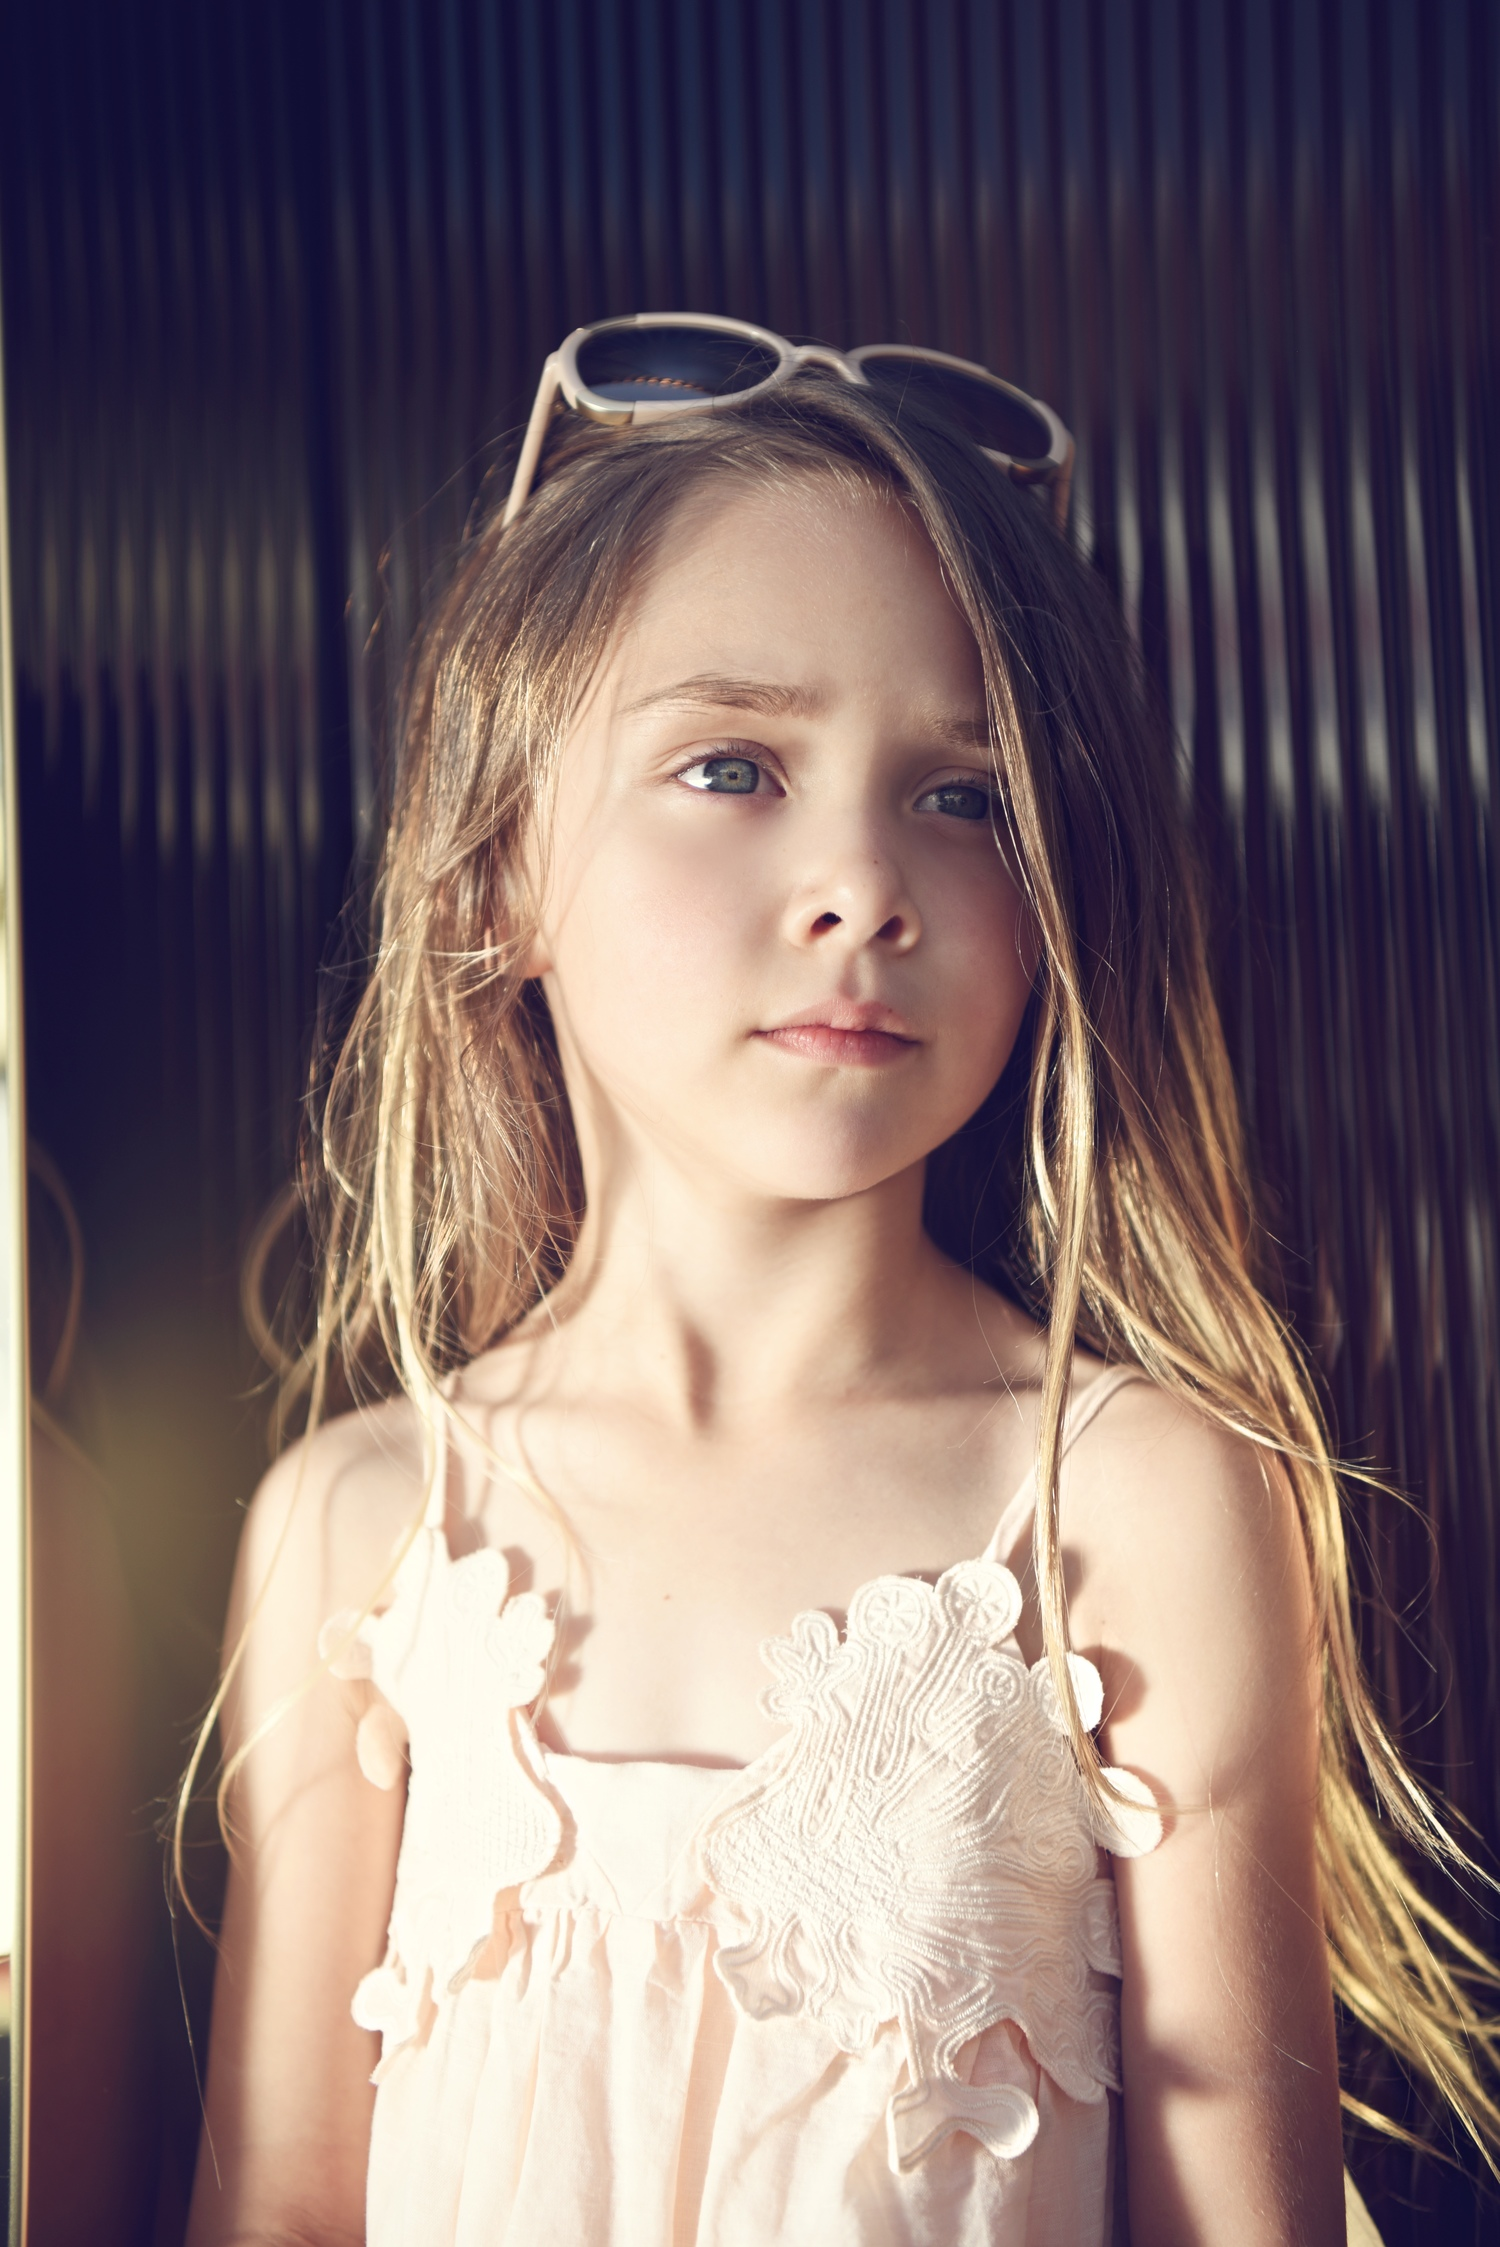 Enfant+Street+Style+by+Gina+Kim+Photography+Chloe+kids-2.jpeg